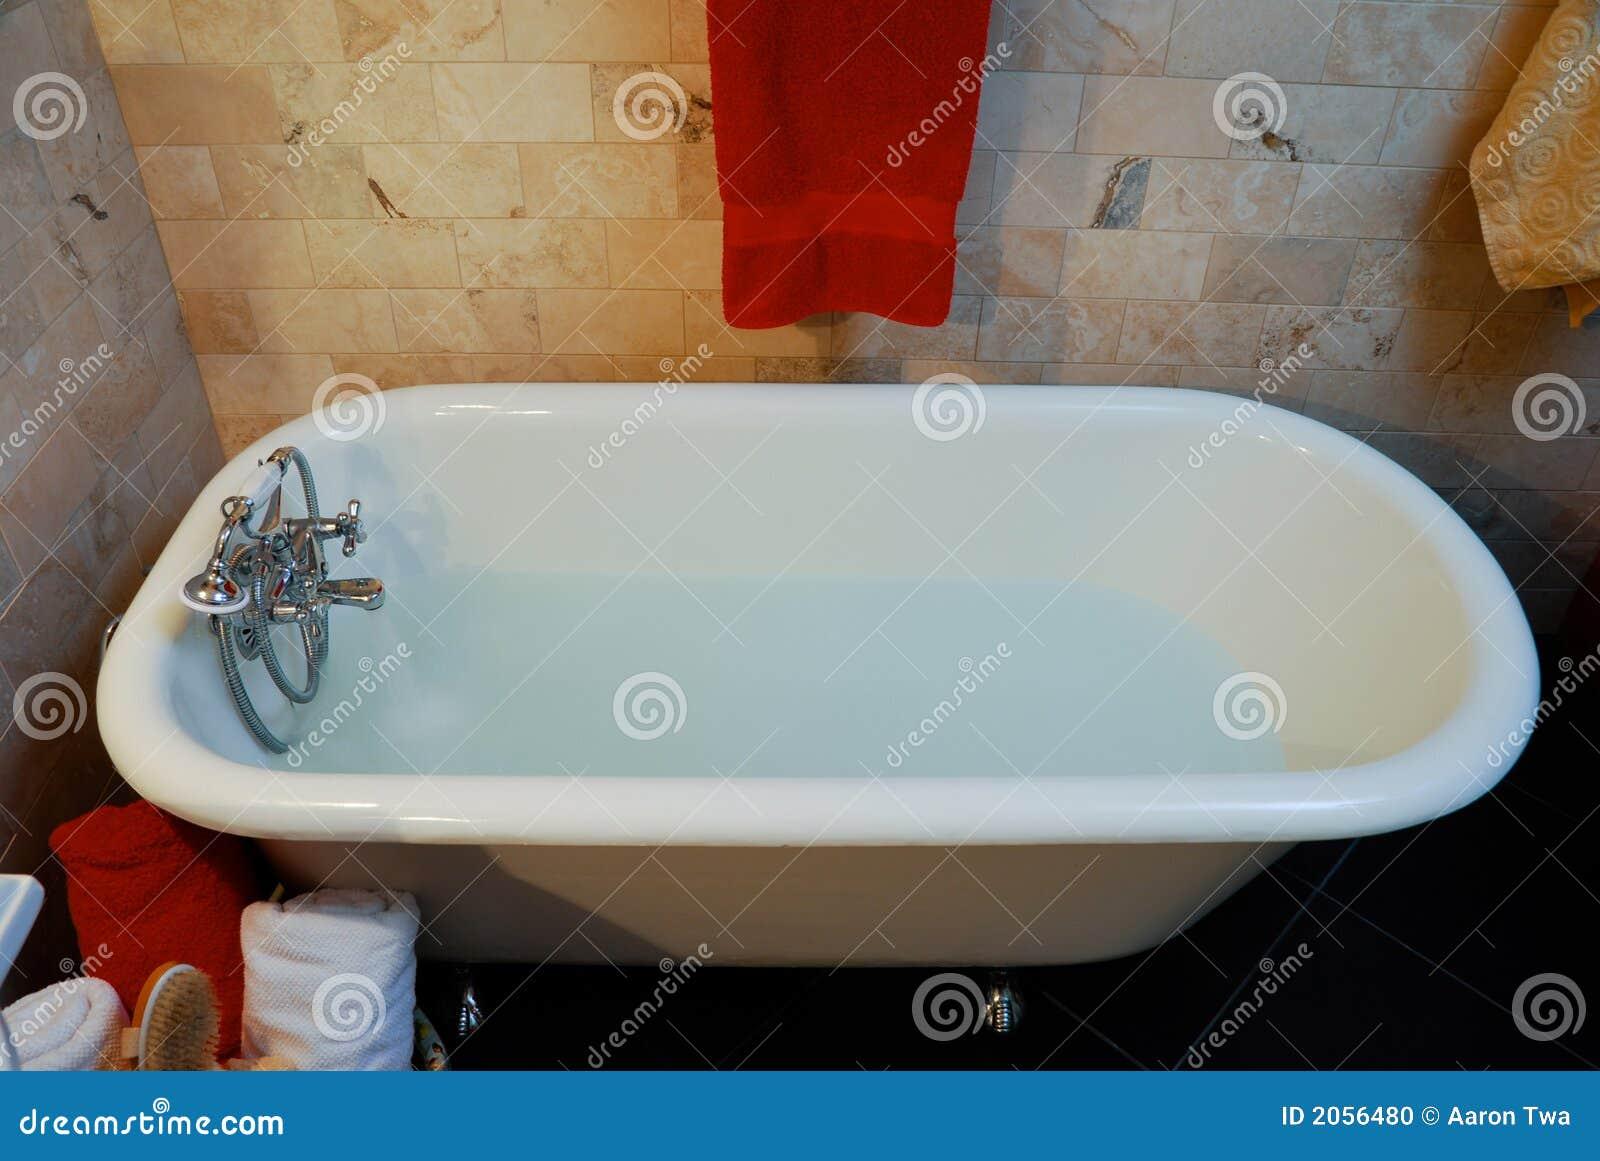 Clawfoot bathtub stock photo. Image of limestone, chrome - 2056480